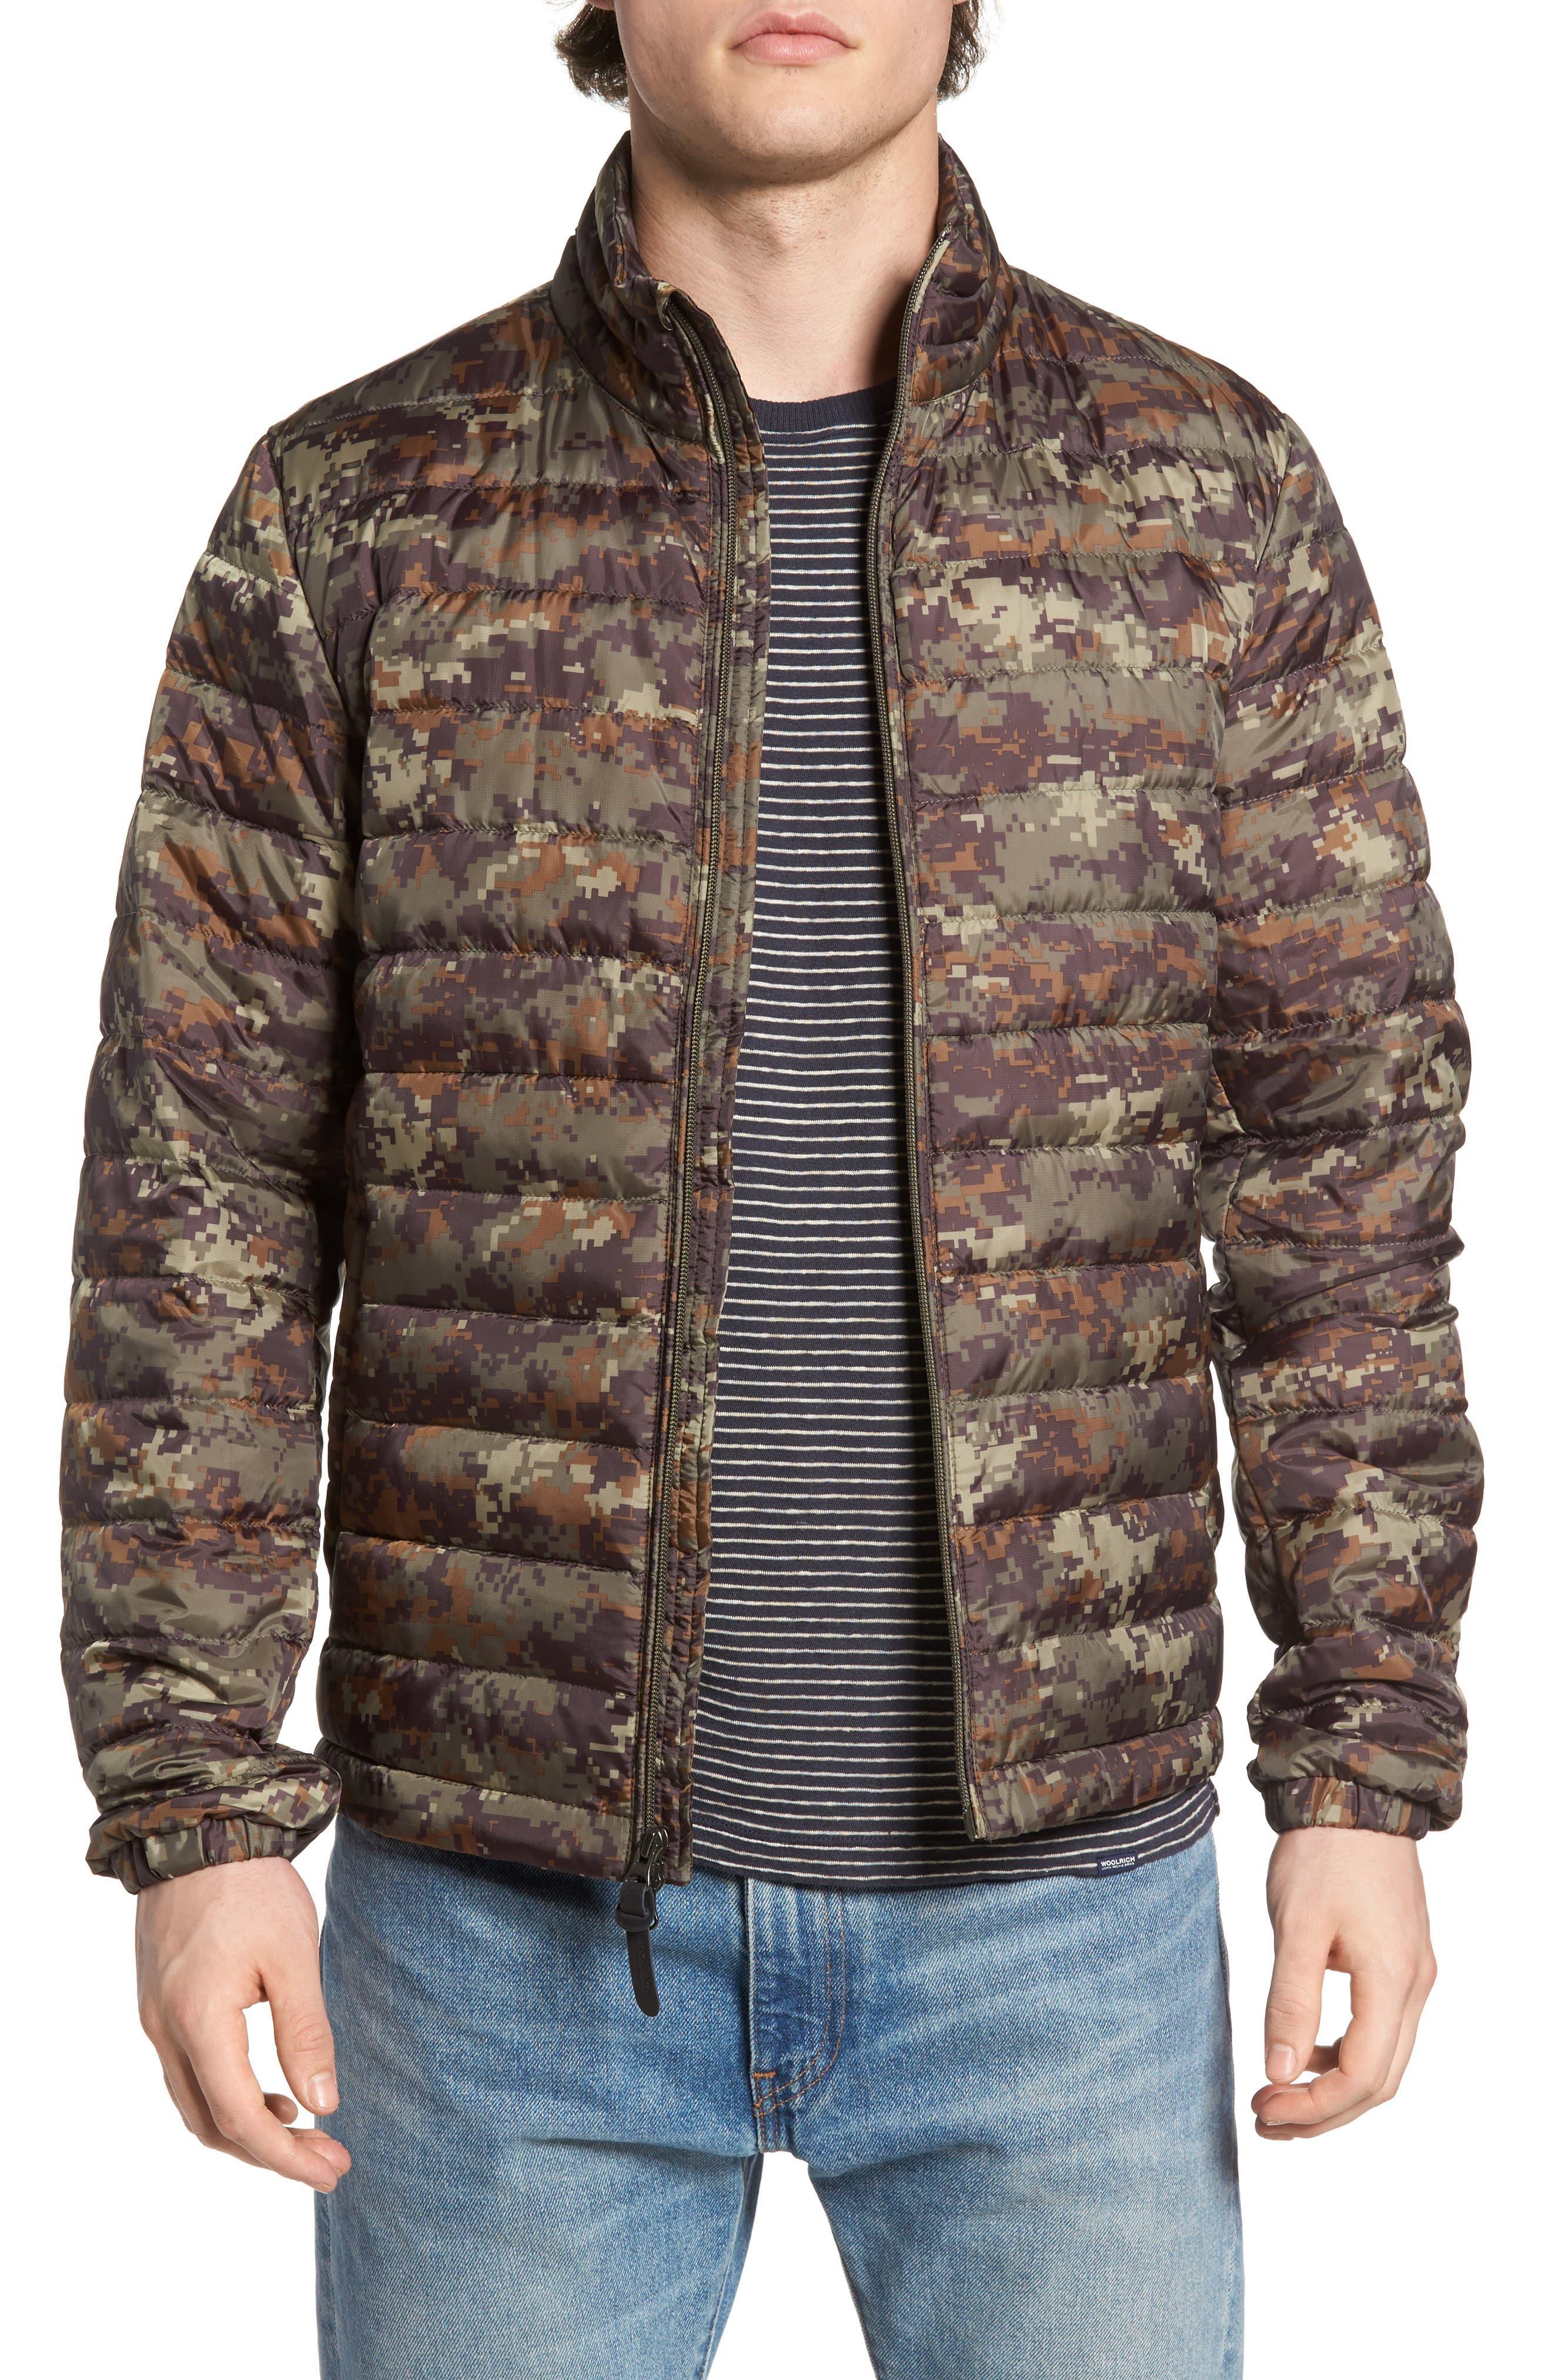 Alternate Image 1 Selected - Woolrich John Rich & Bros Camou Sundance Down Jacket